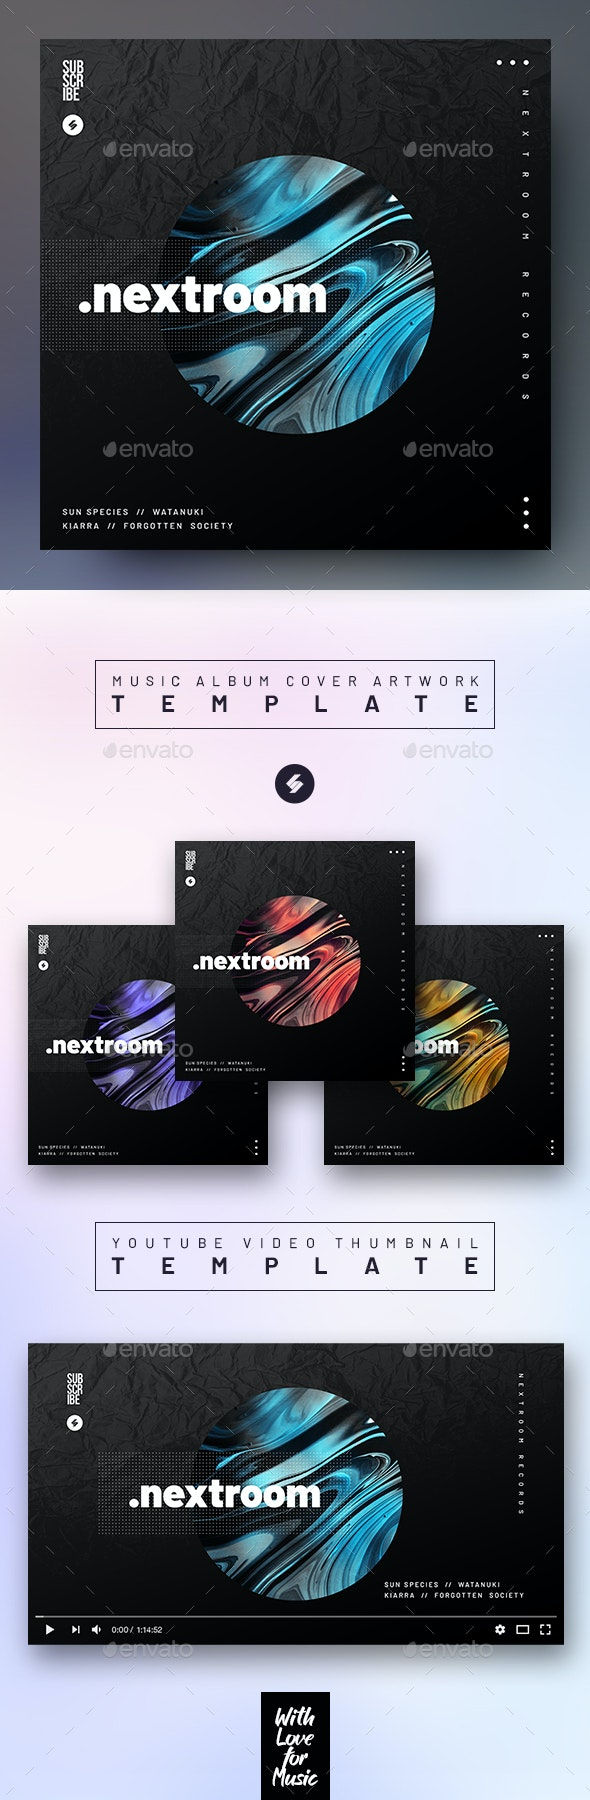 Nextroom – Music Album Cover Artwork / Video Thumbnail Template - Miscellaneous Social Media